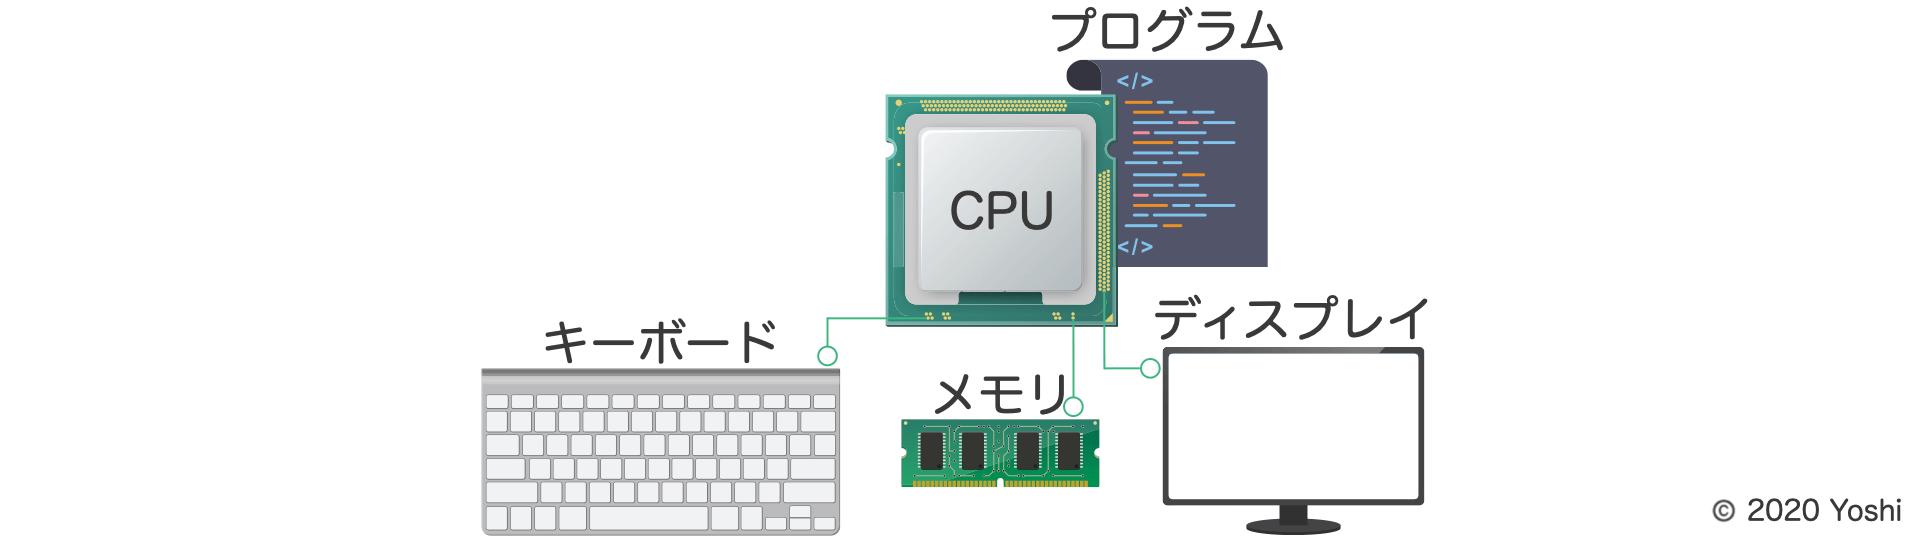 CPUはプログラムの命令に従って各装置を制御